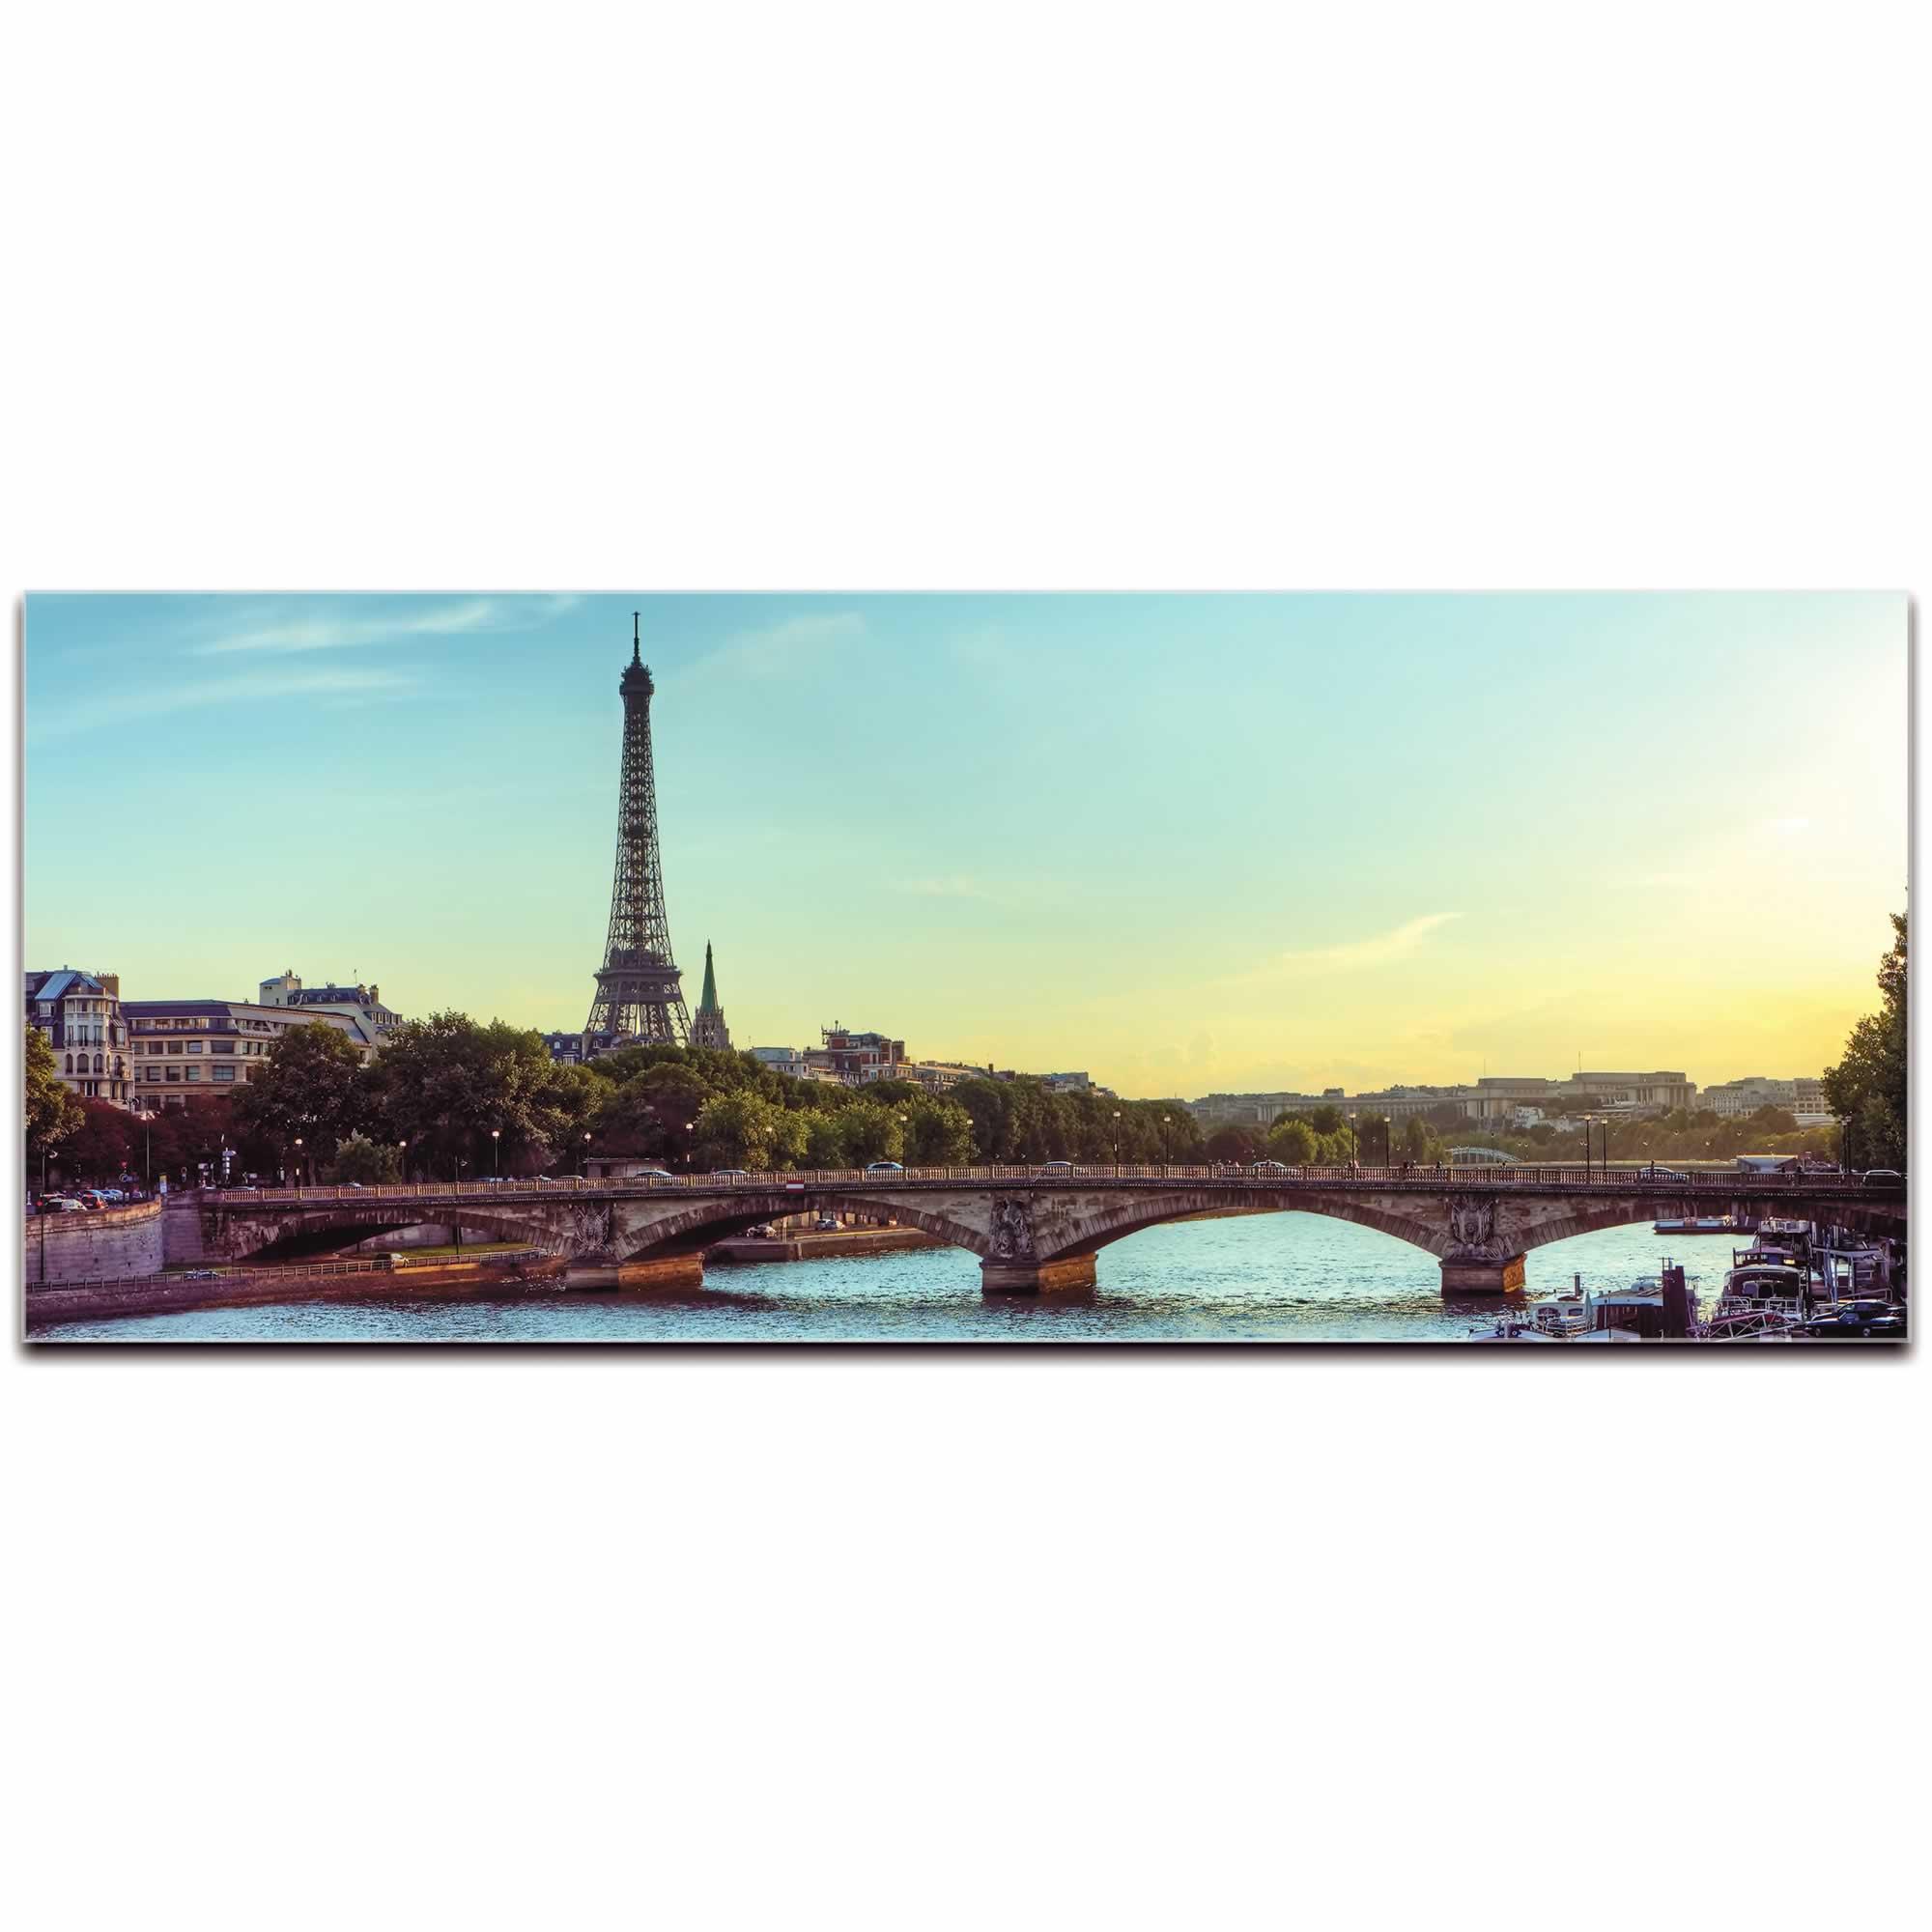 Classic Paris City Skyline - Urban Modern Art, Designer Home Decor, Cityscape Wall Artwork, Trendy Contemporary Art